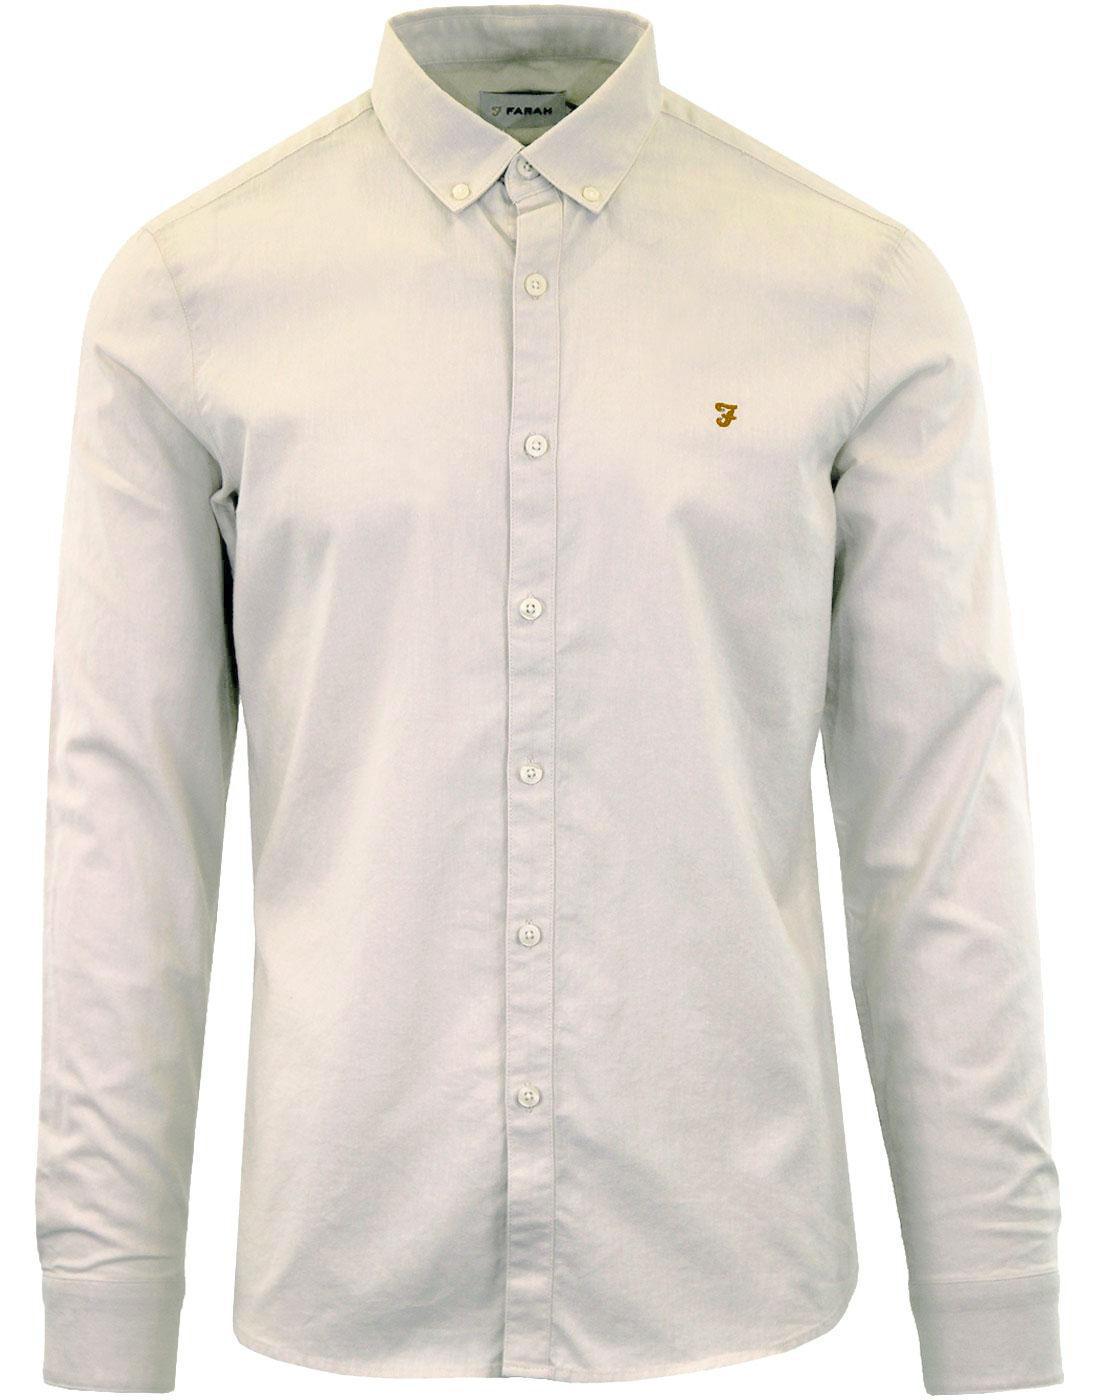 Steen FARAH Retro Button Down Oxford Shirt PEBBLE